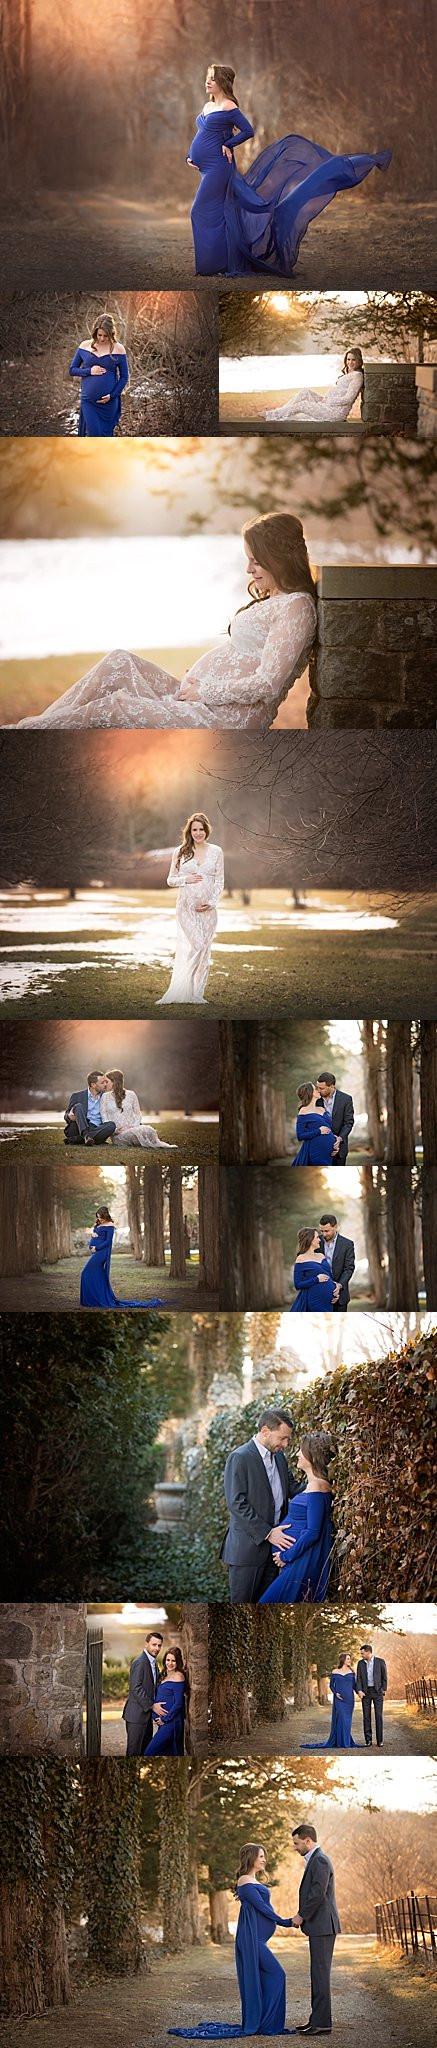 New Jersey maternity photographer